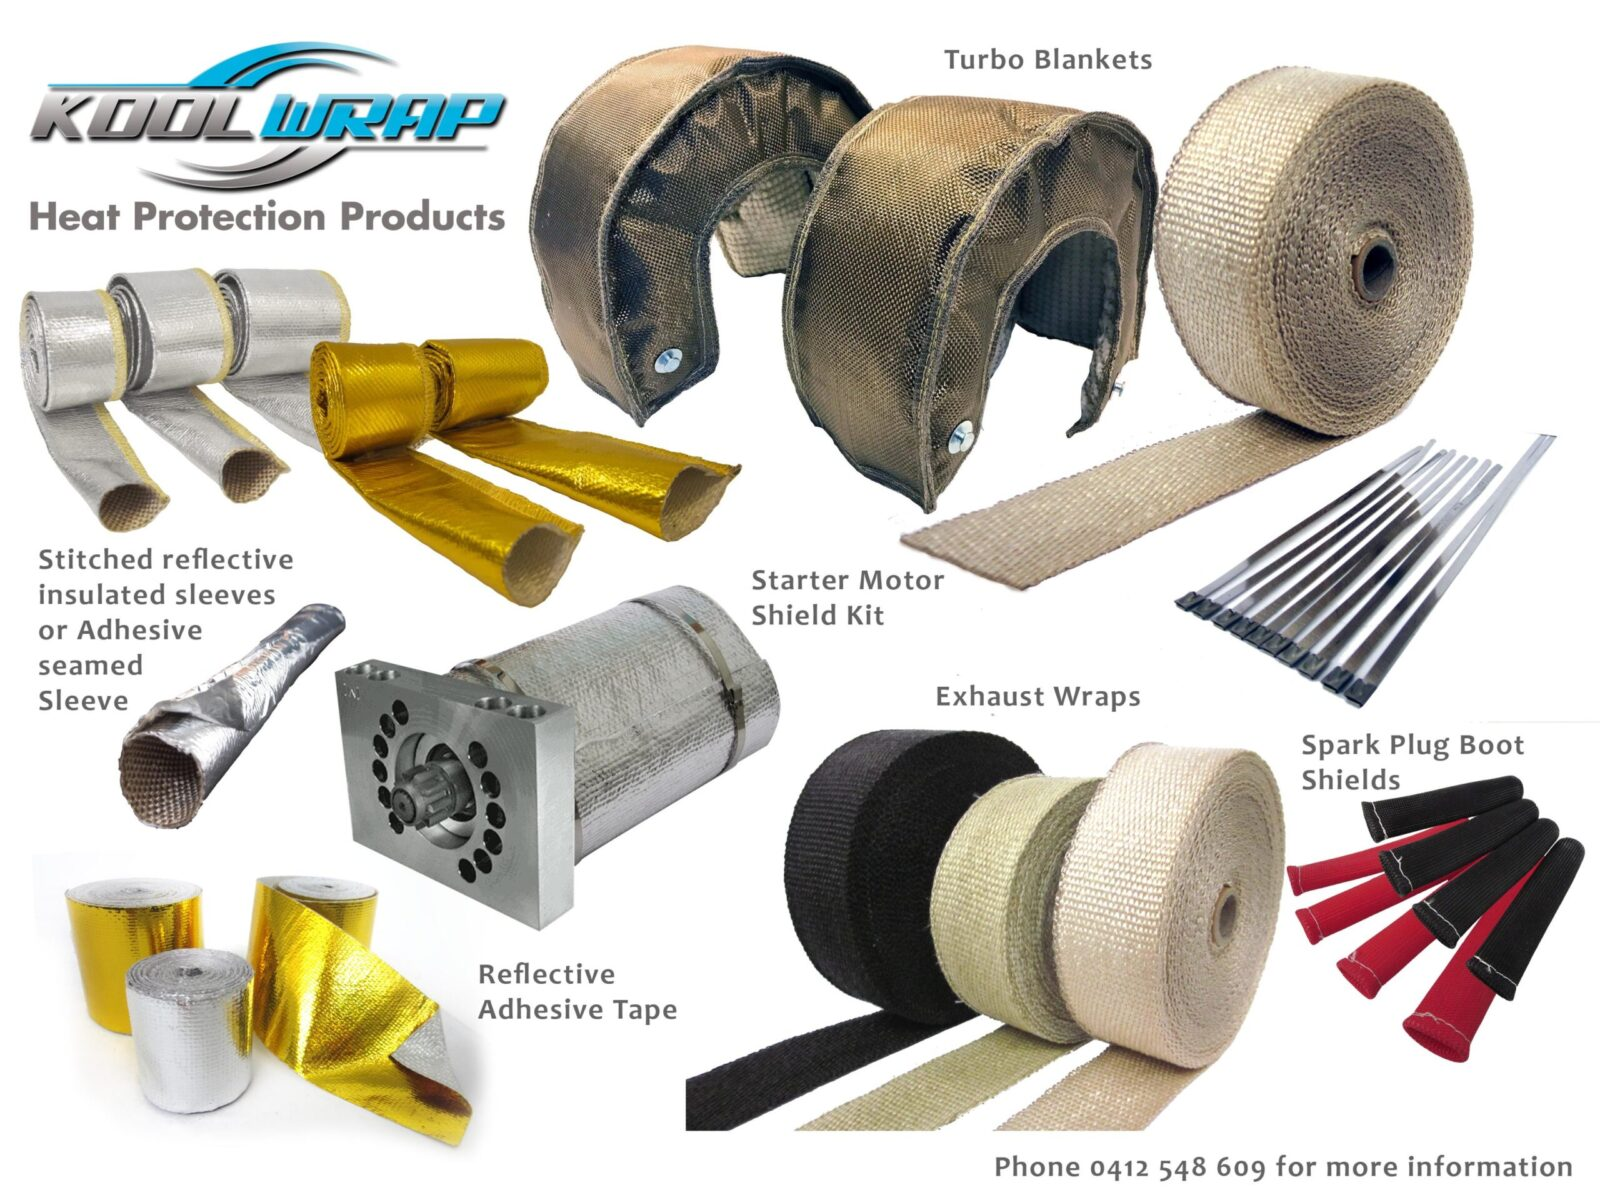 Kool Wrap Heat Protection Product Range